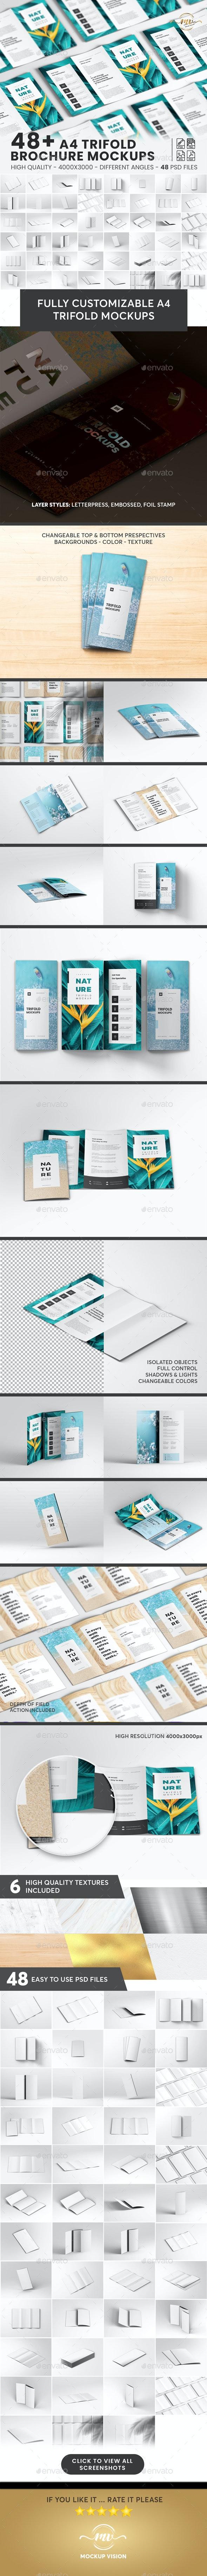 48+ A4 Trifold, Brochure Mockup Bundle - Brochures Print